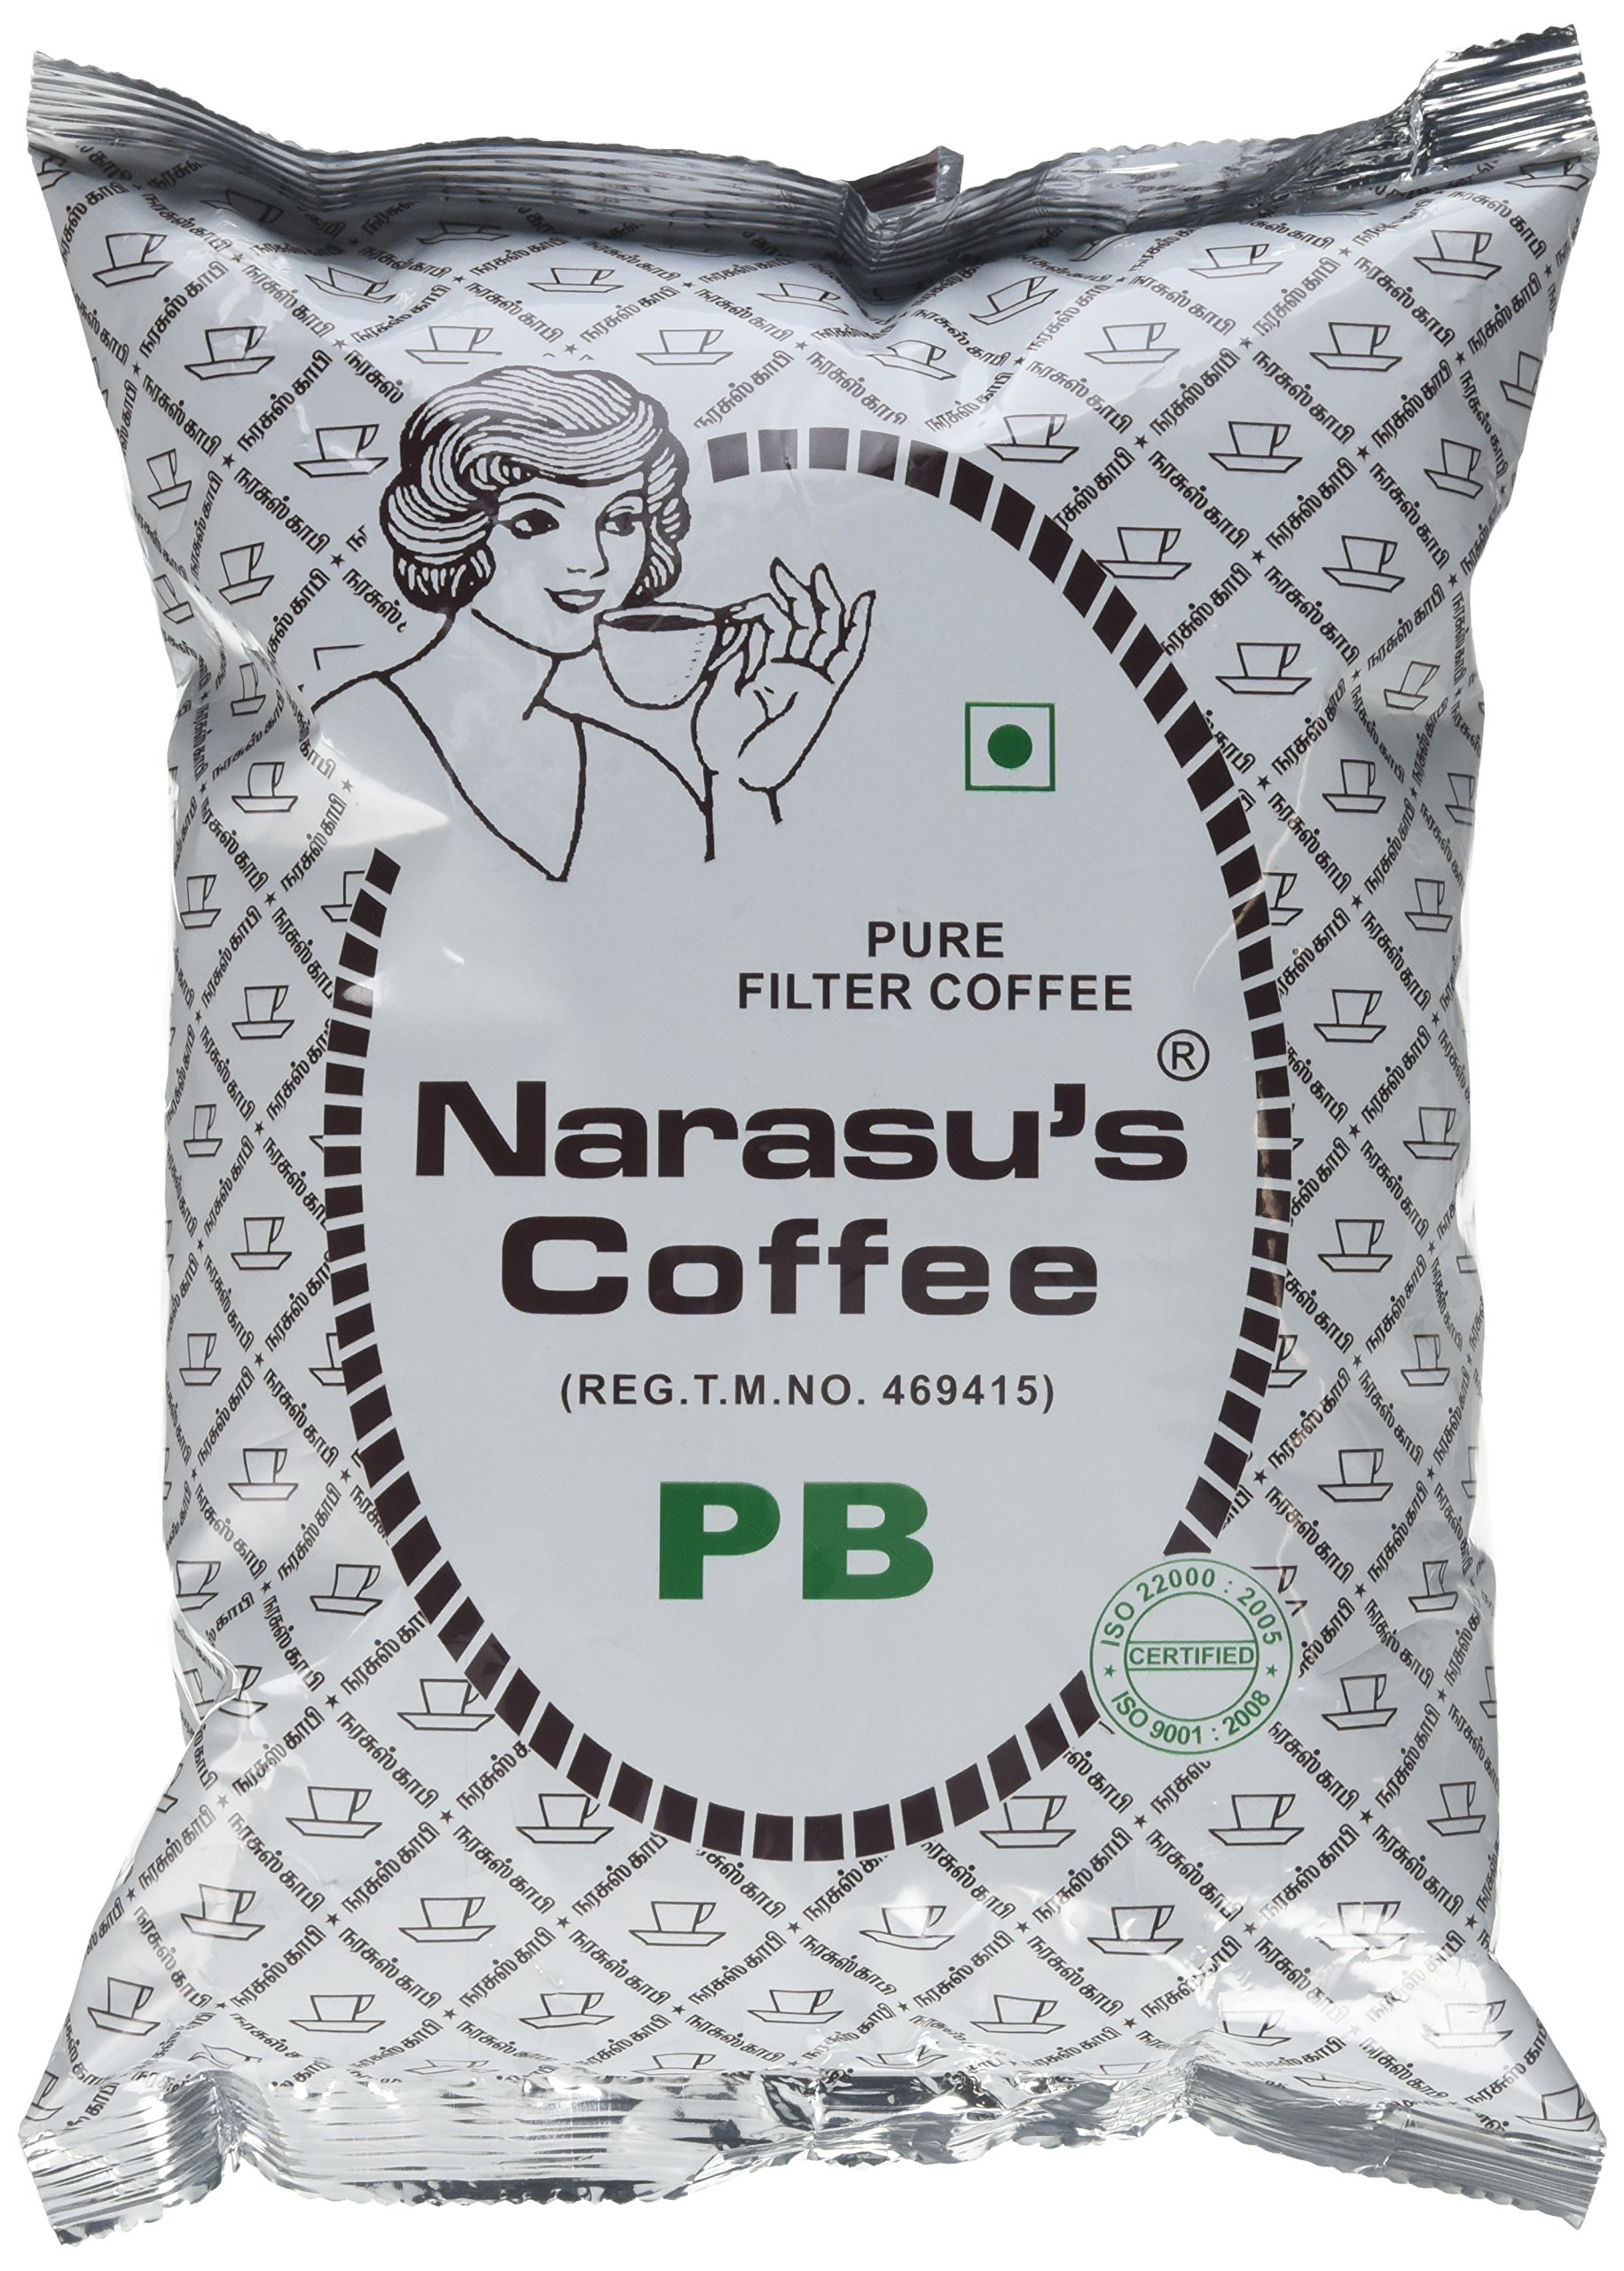 Narasu's, Narasu's Coffee, 500 Grams(gm)